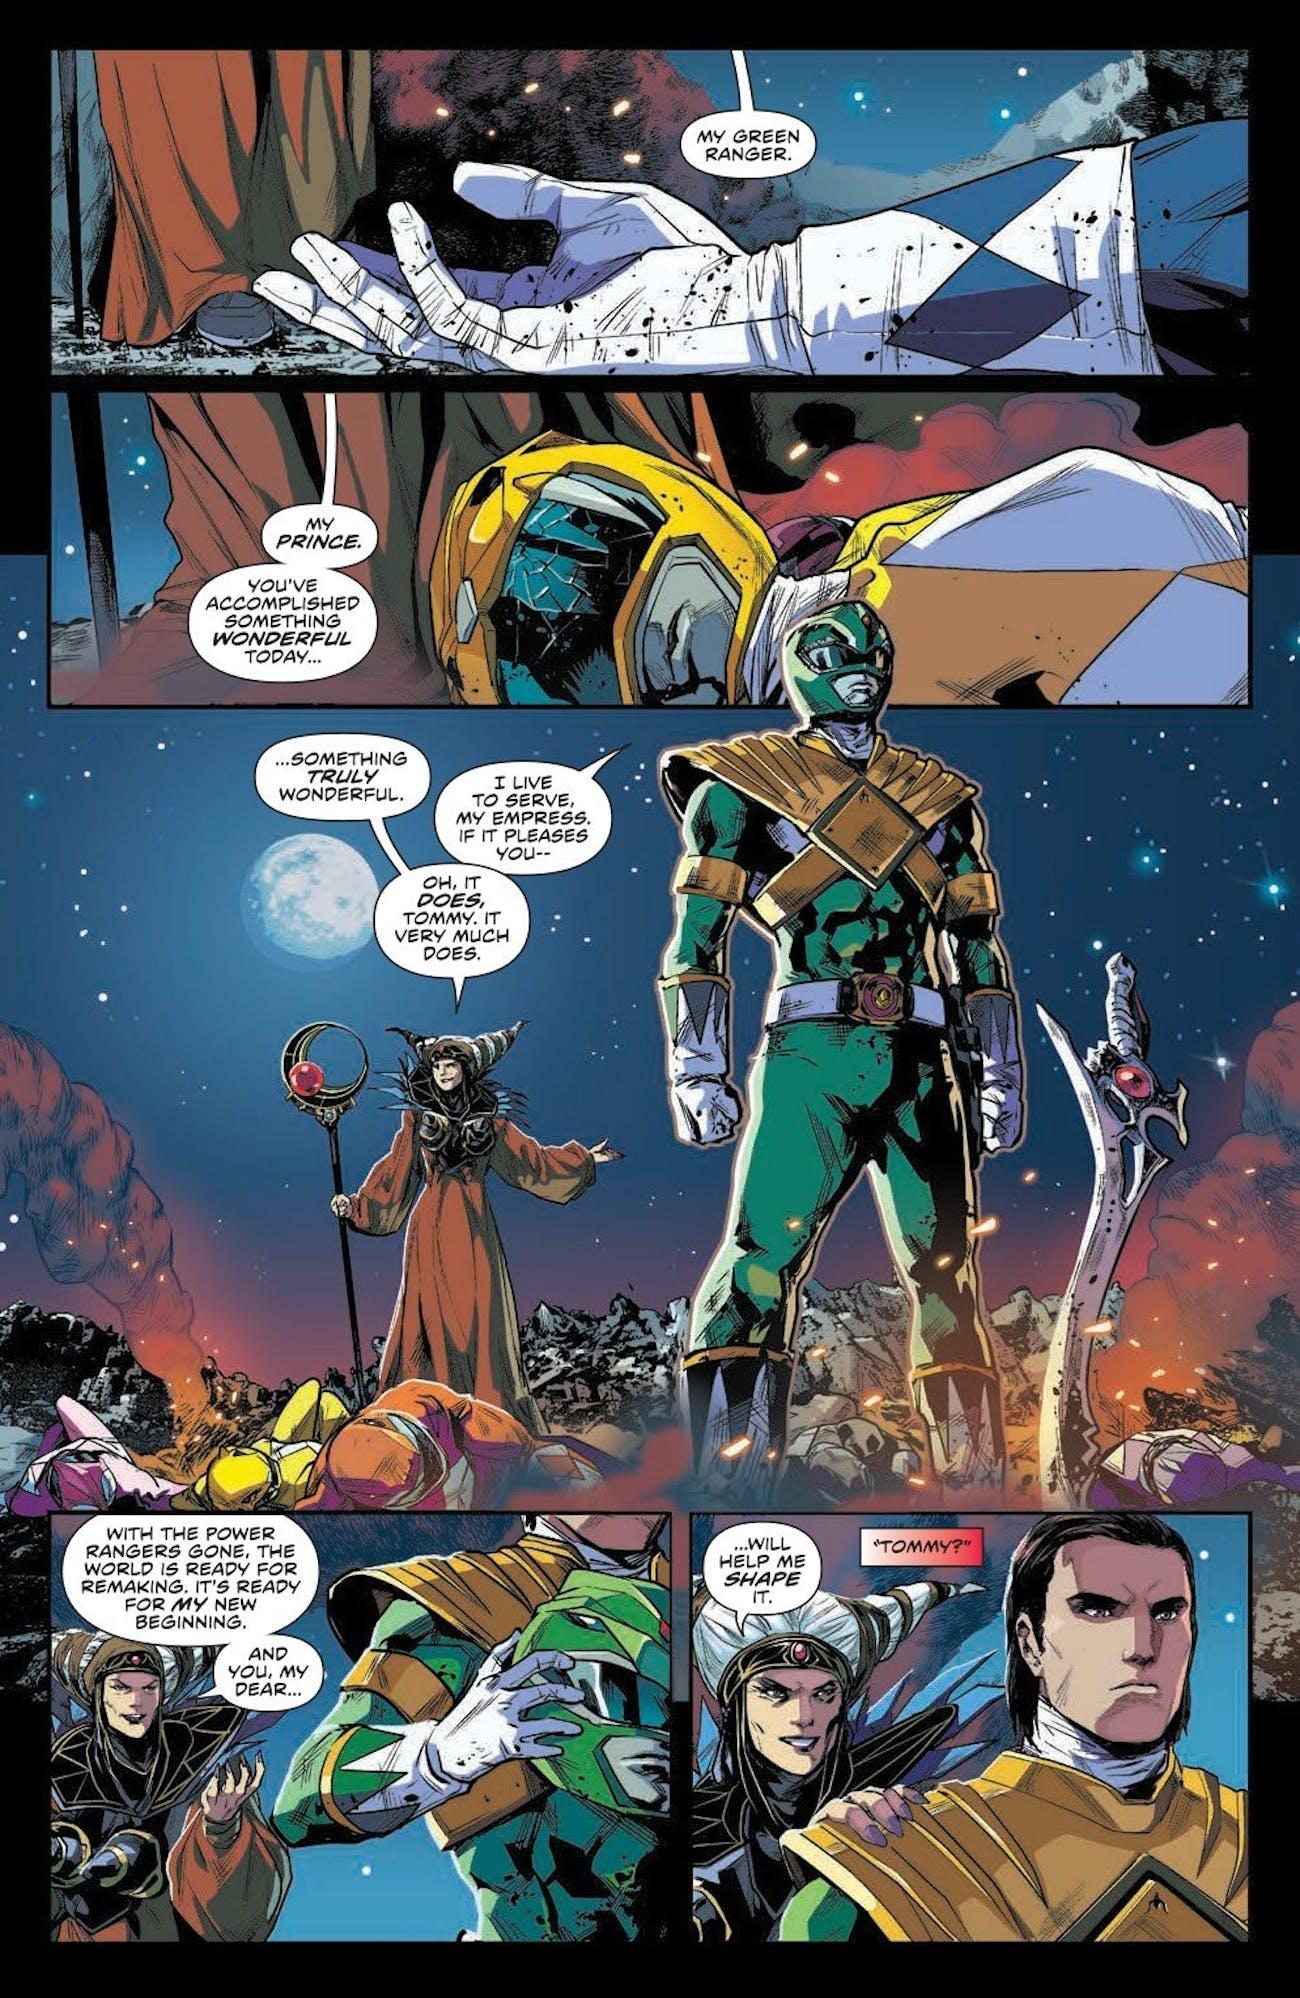 Anti-Nostalgic 'Power Rangers' Was One of 2016's Best Comics | Inverse